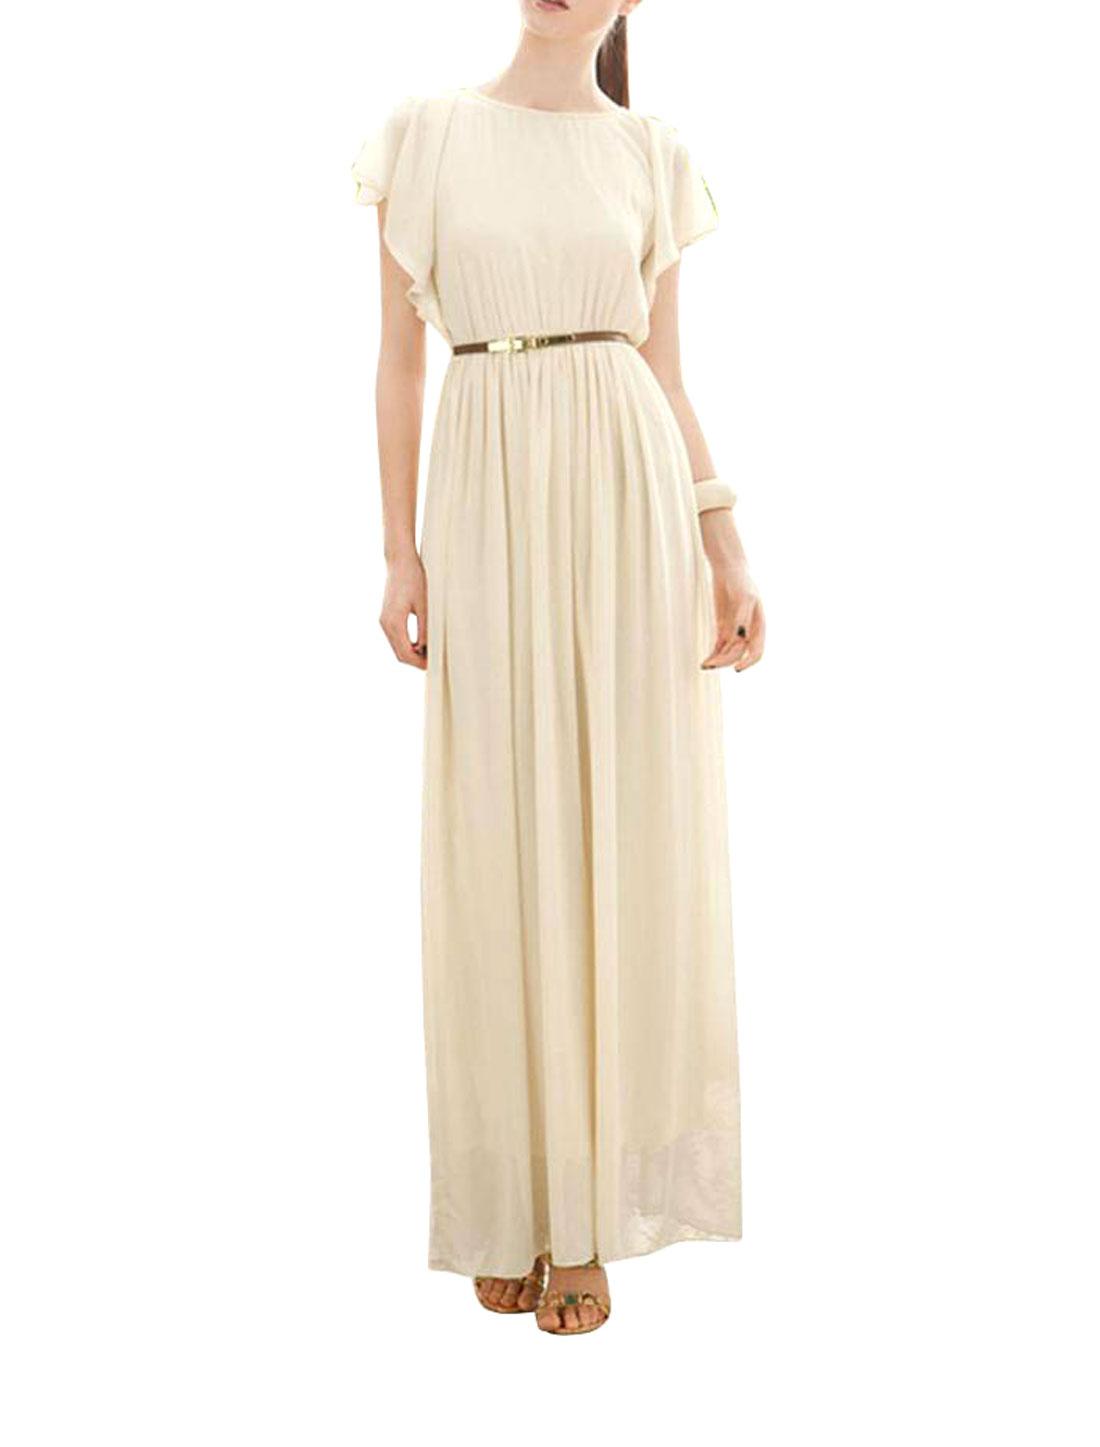 Women Flounce Sleeve Button Down Split Back Elegant Chiffon Long Dress Apricot Color XS